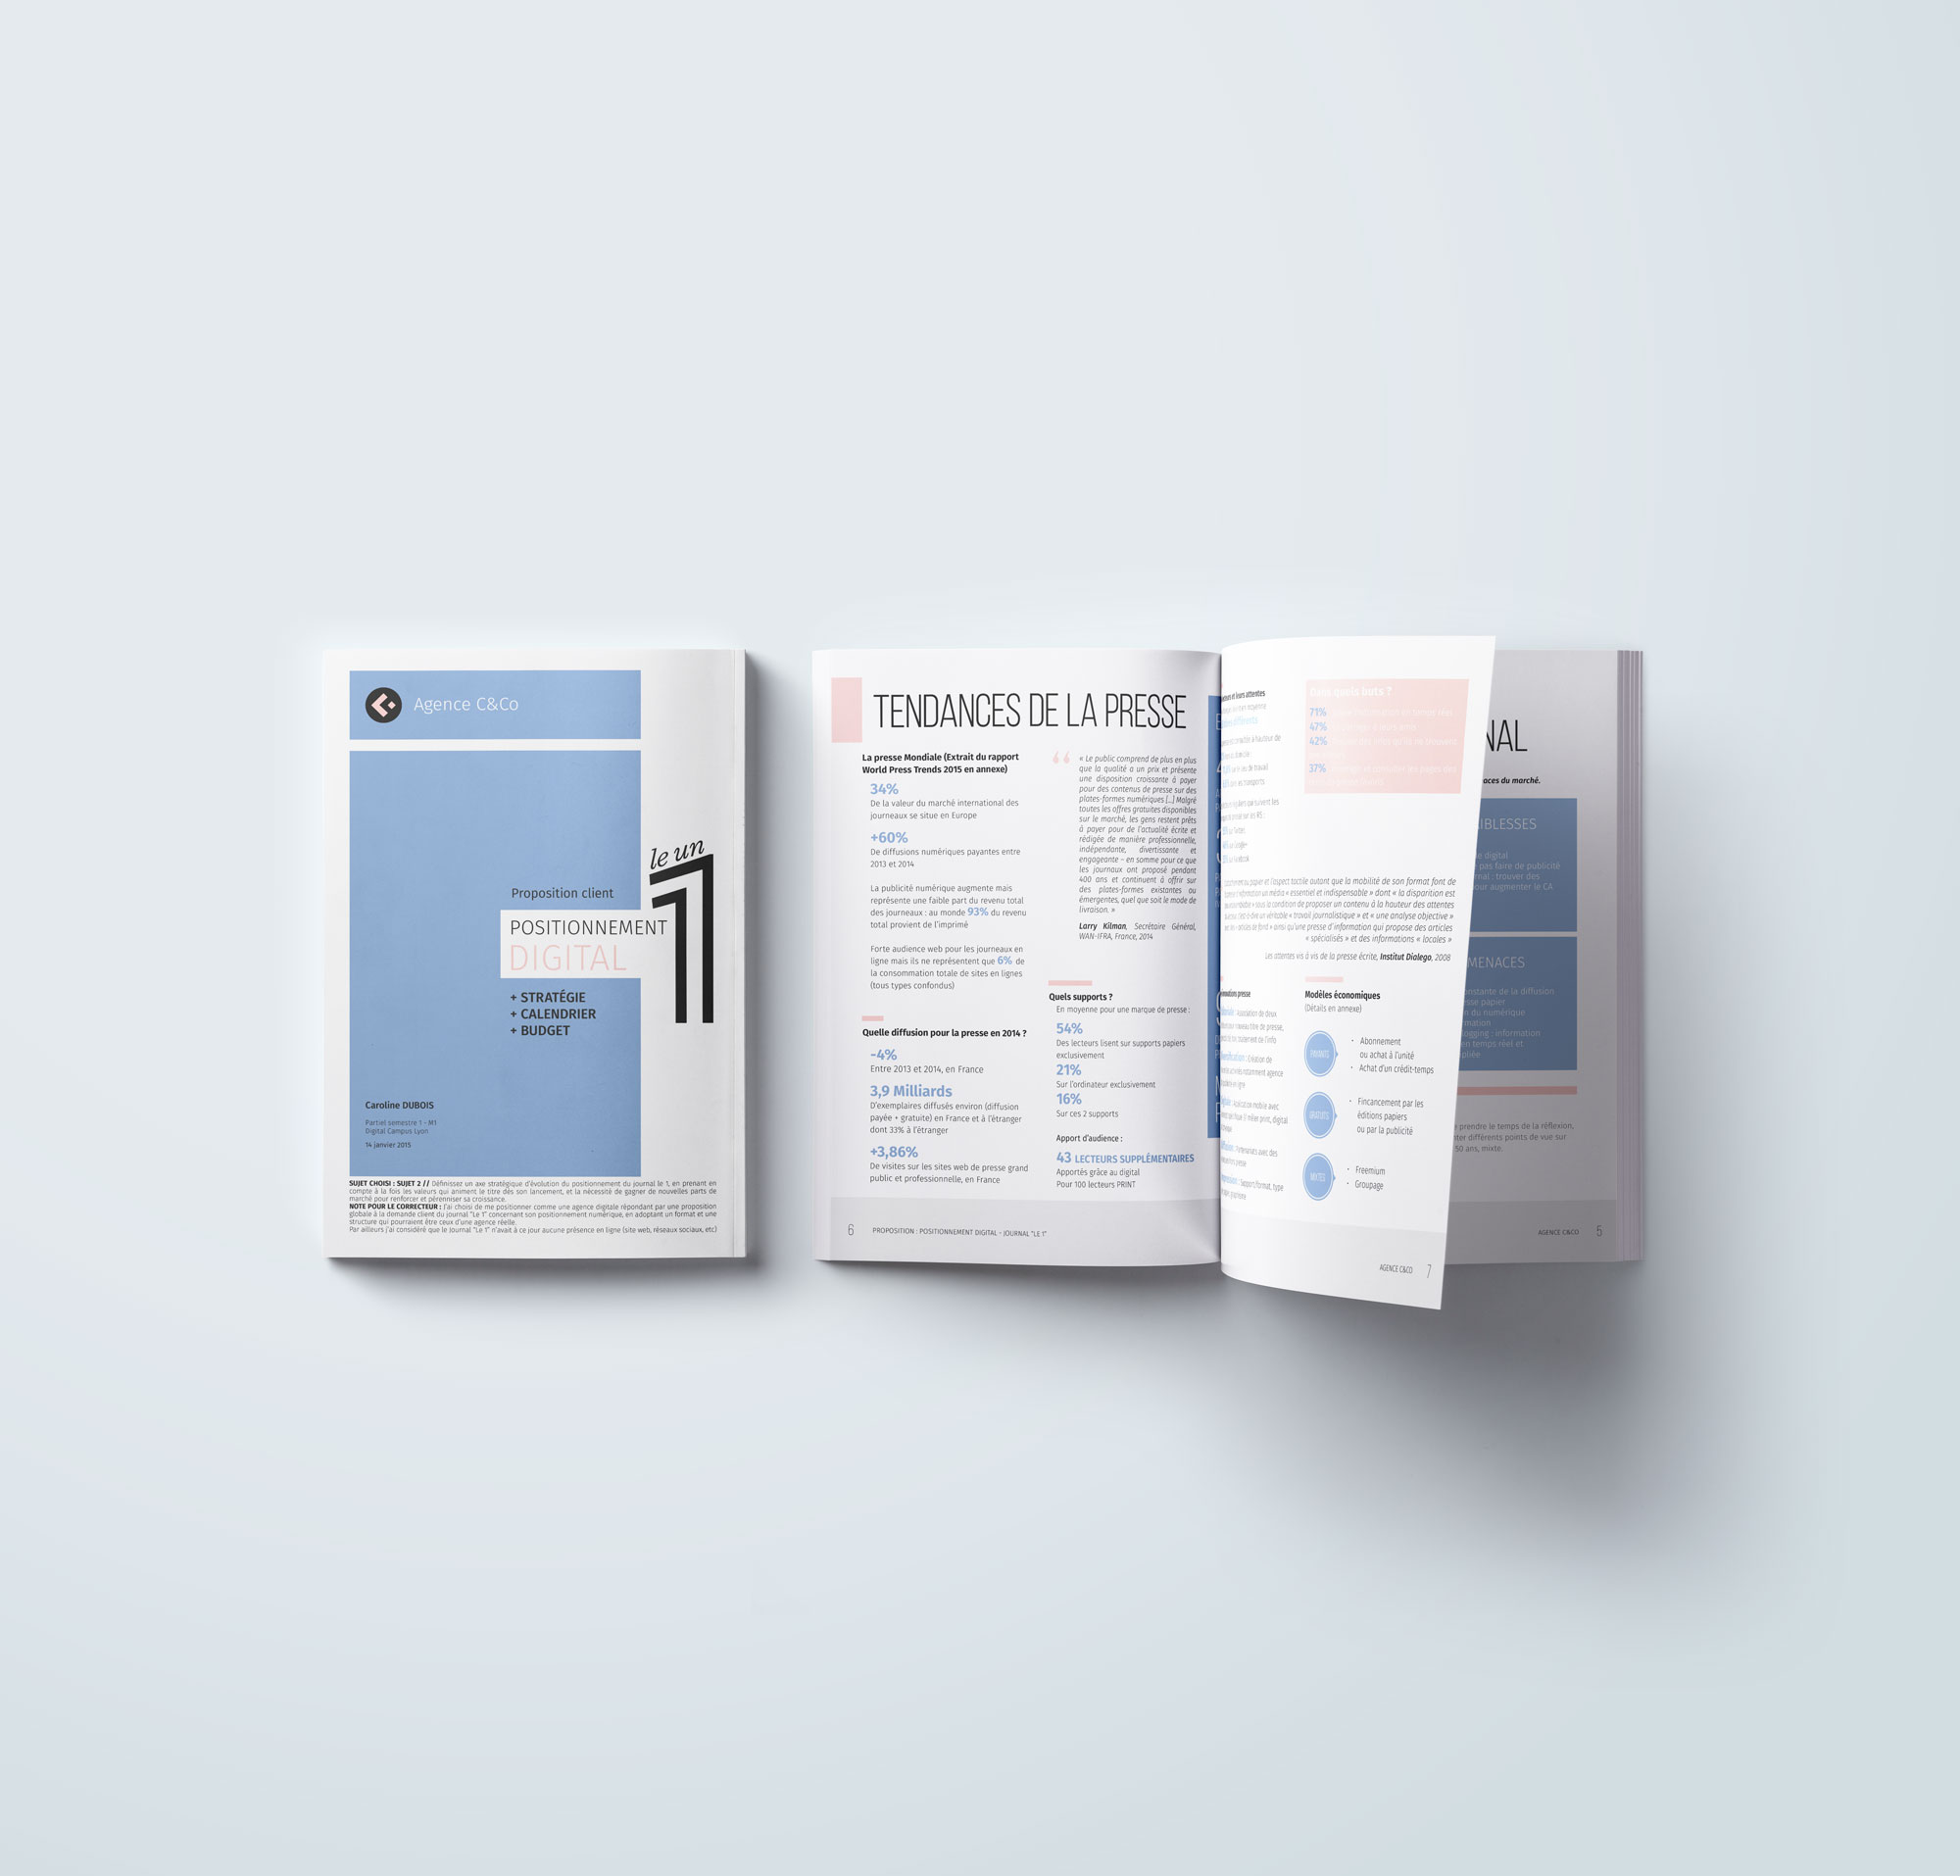 JournalLe1